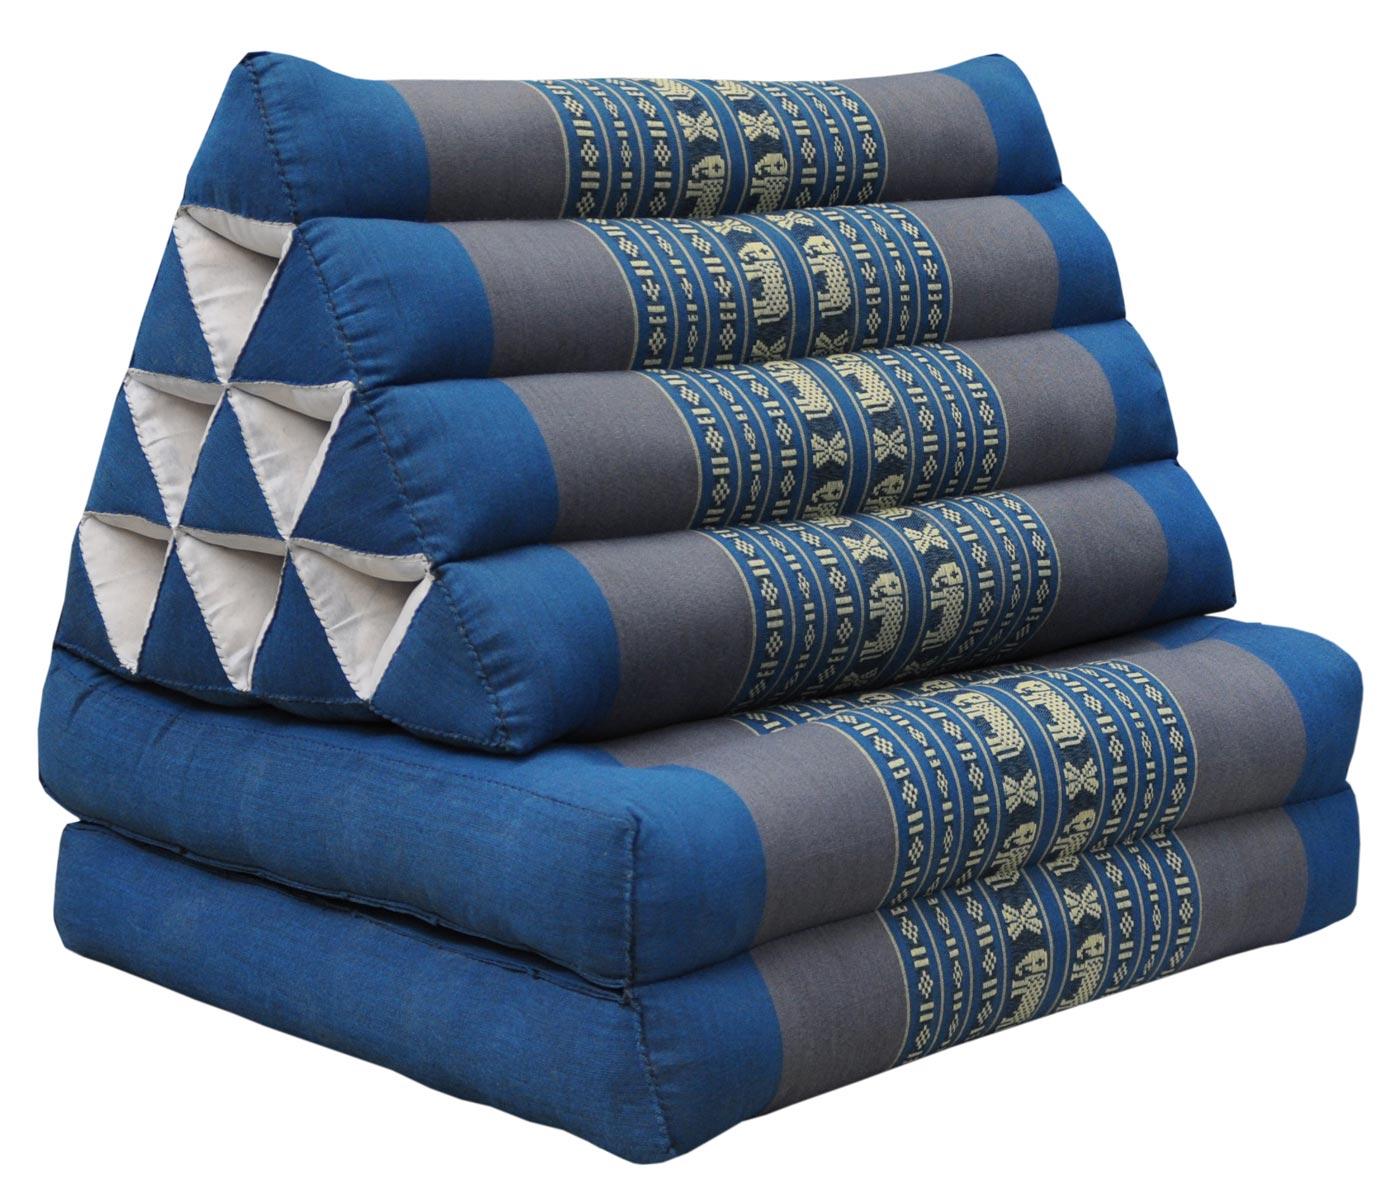 Yoga Bolster Meditation: Cushions, Mattress, Pillow Pad Meditation Bolster Yoga